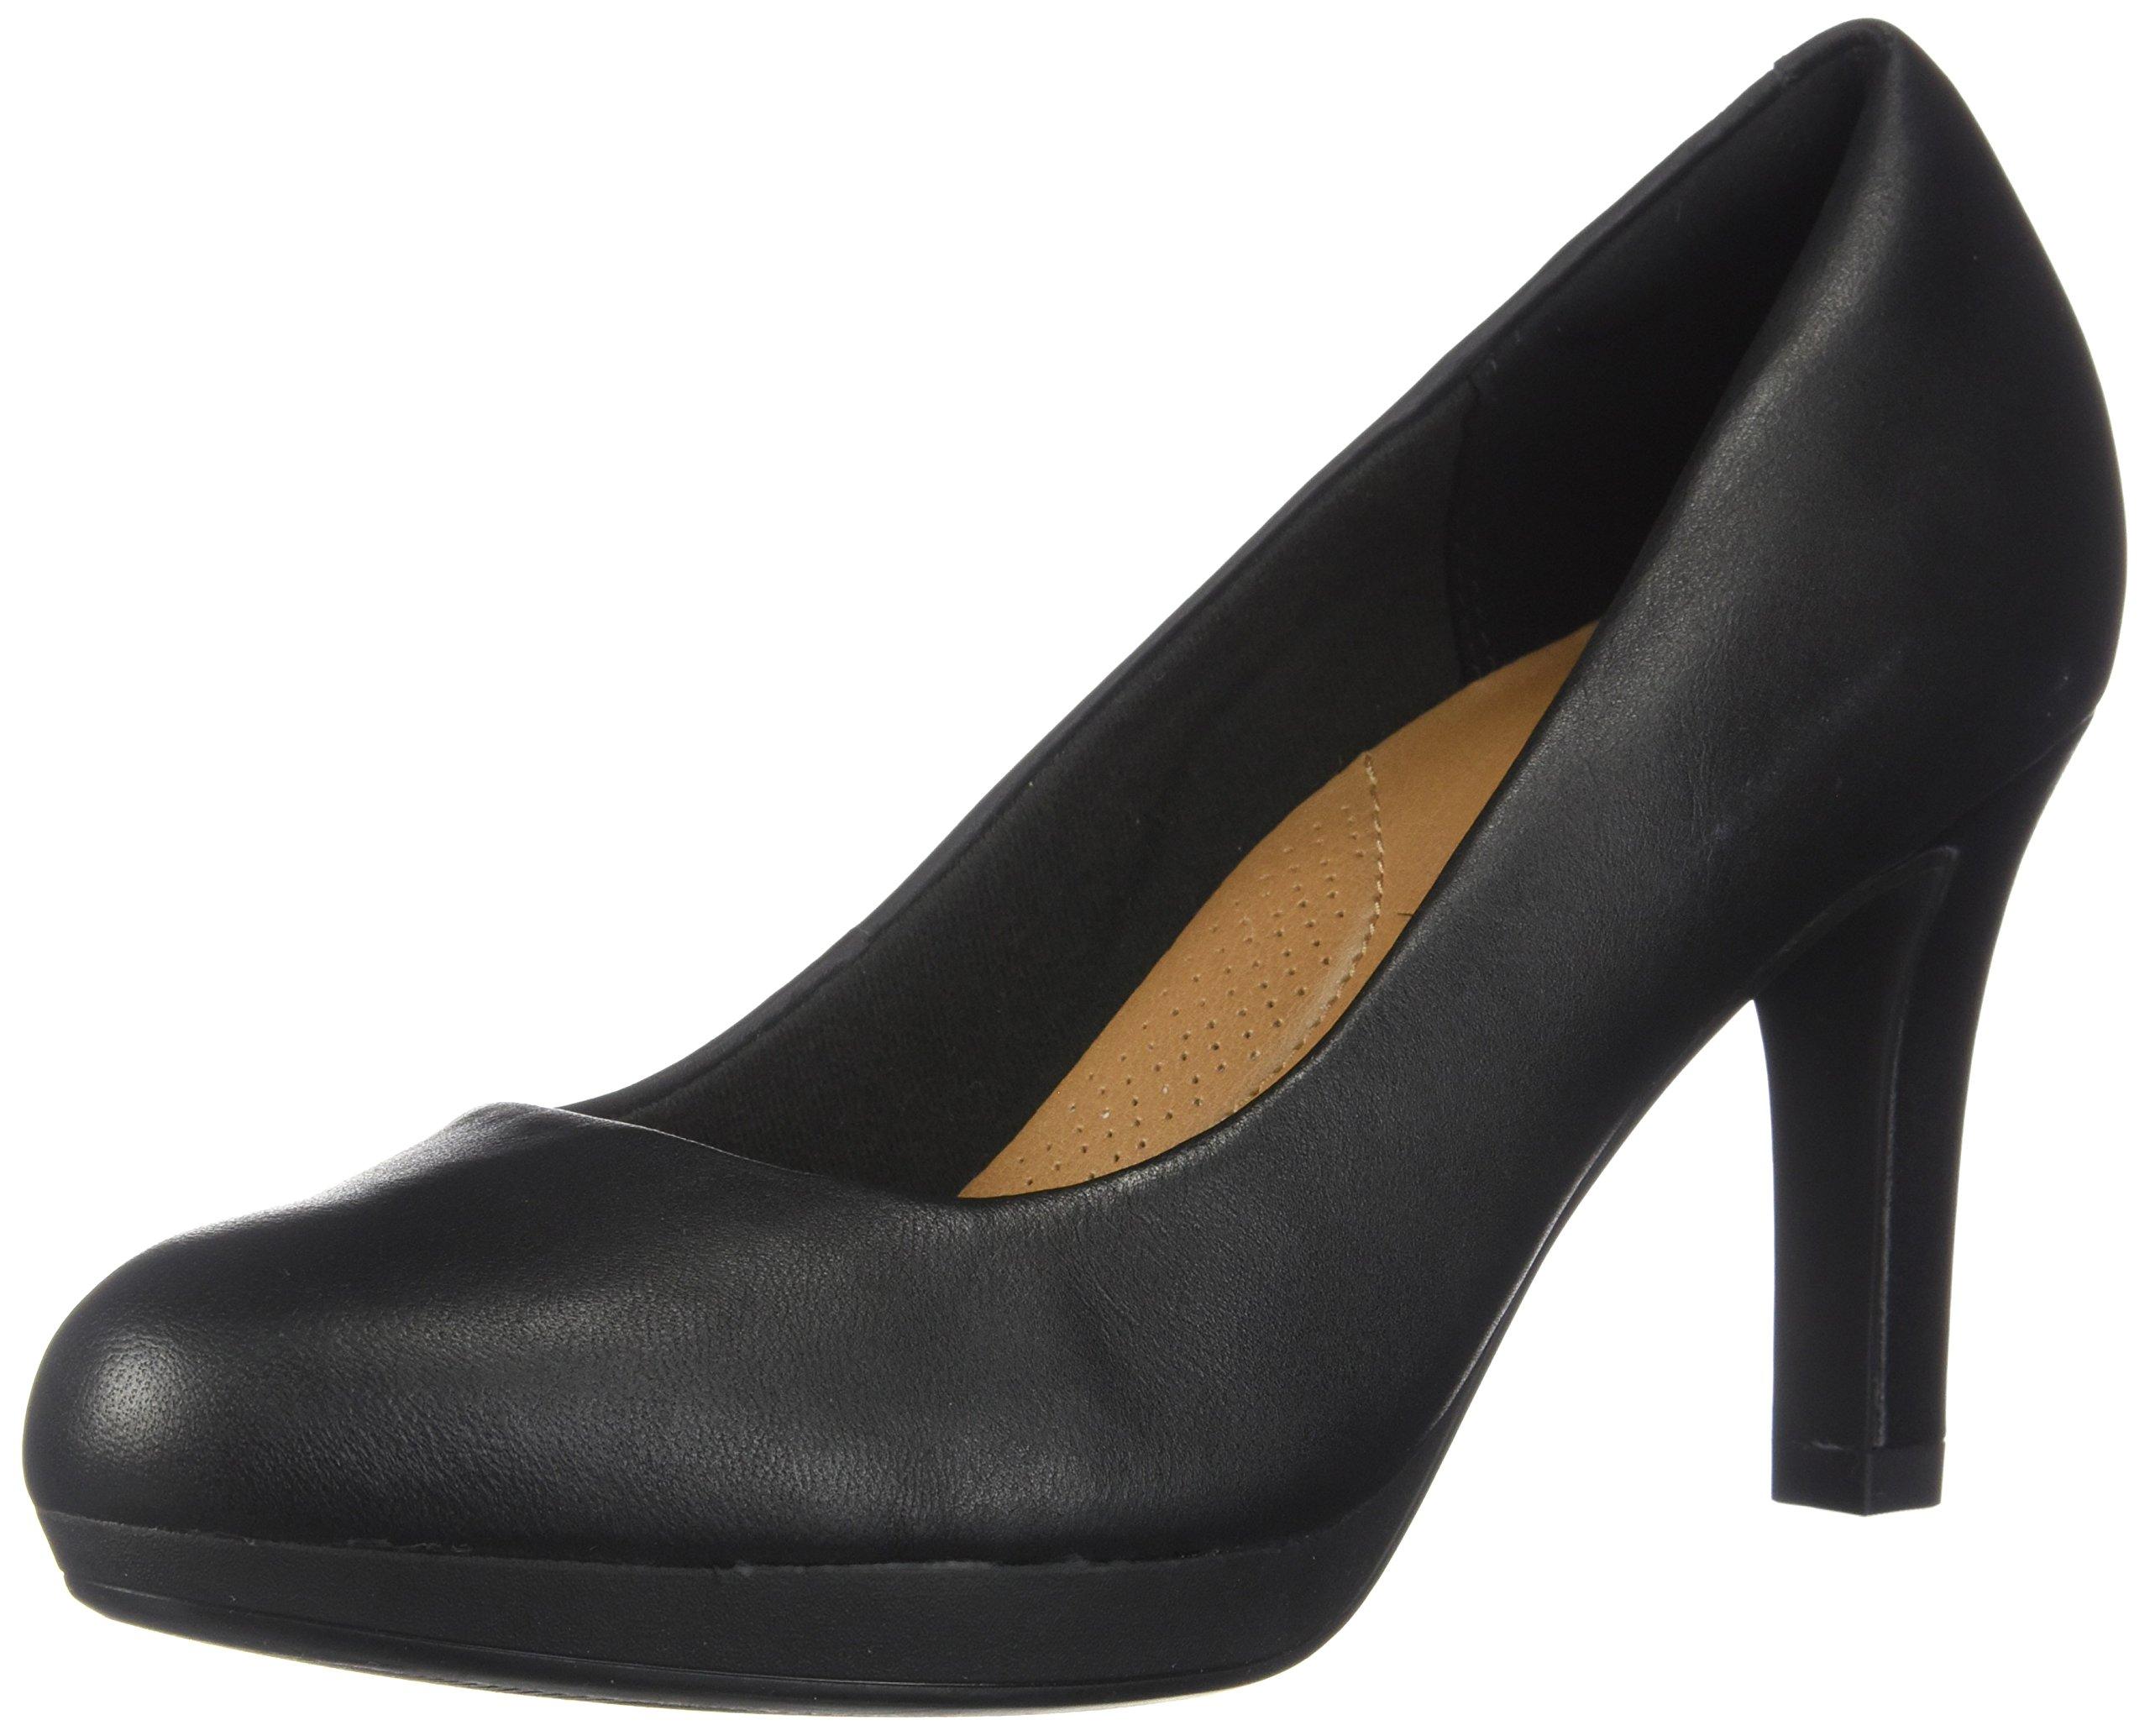 CLARKS Women's Adriel Viola Dress Pump, Black Leather, 7.5 M US